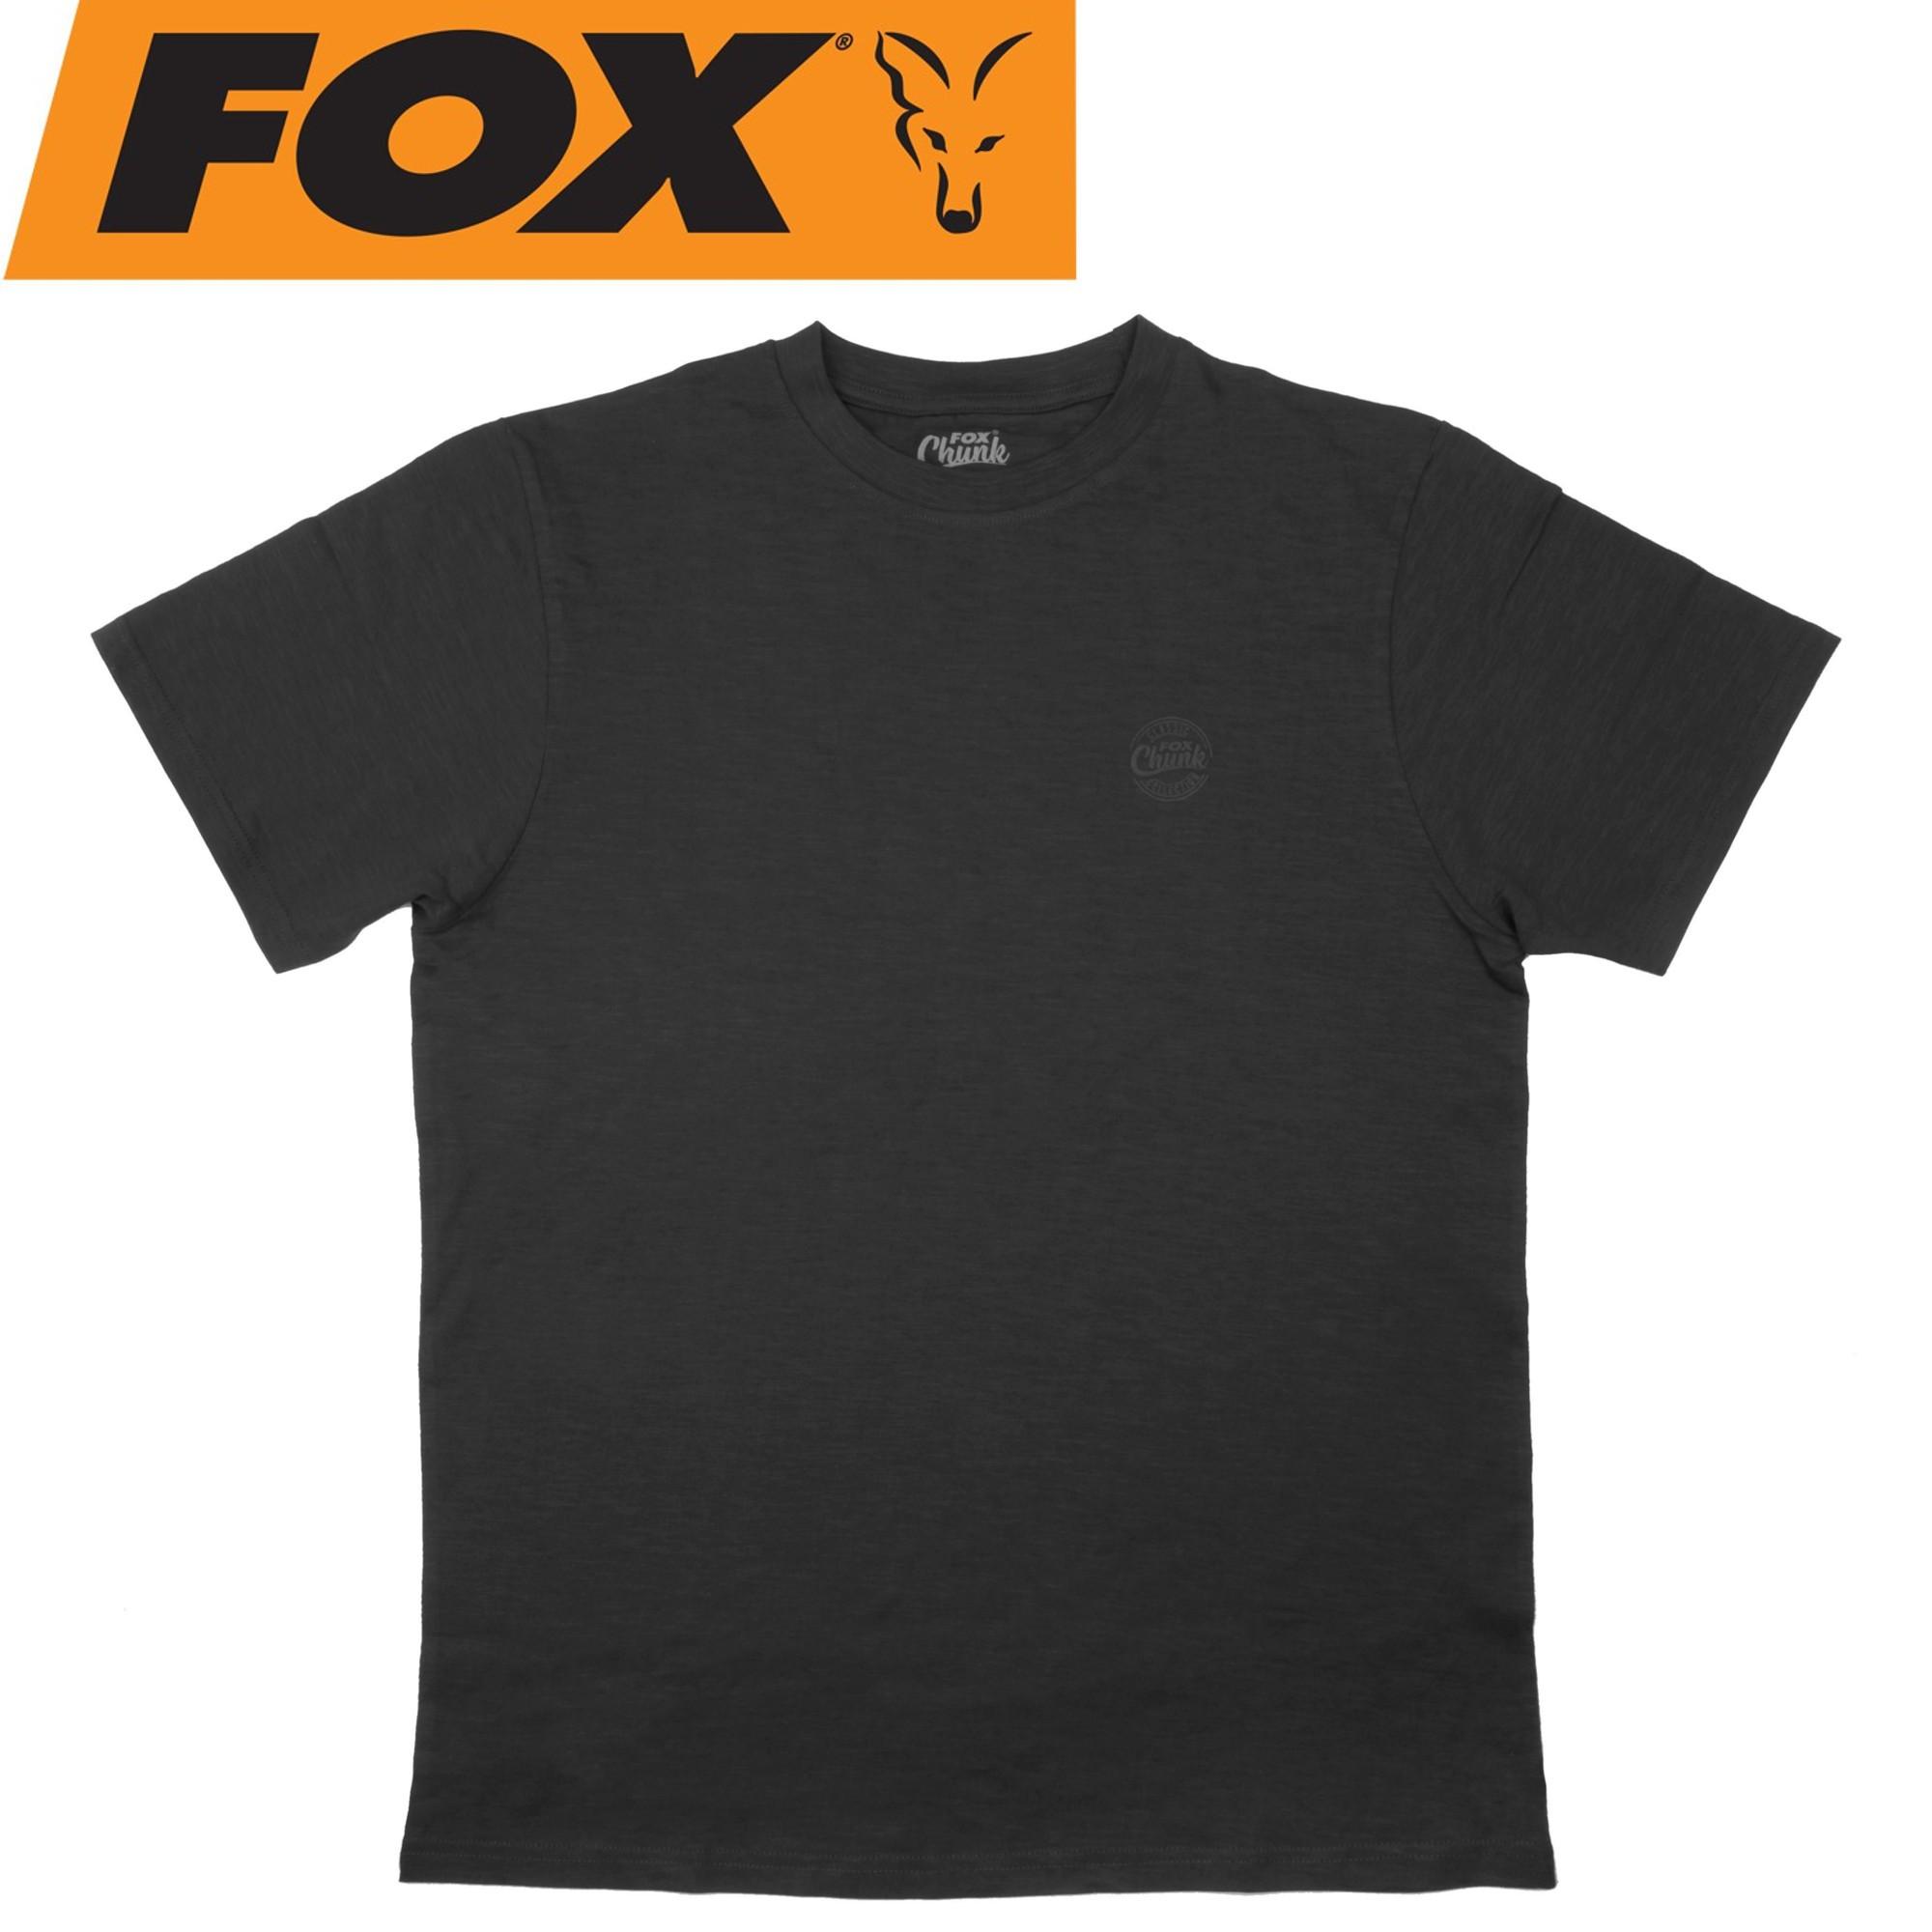 Fox chunk classic grey marl t shirt angelshirt for Grey marl t shirt